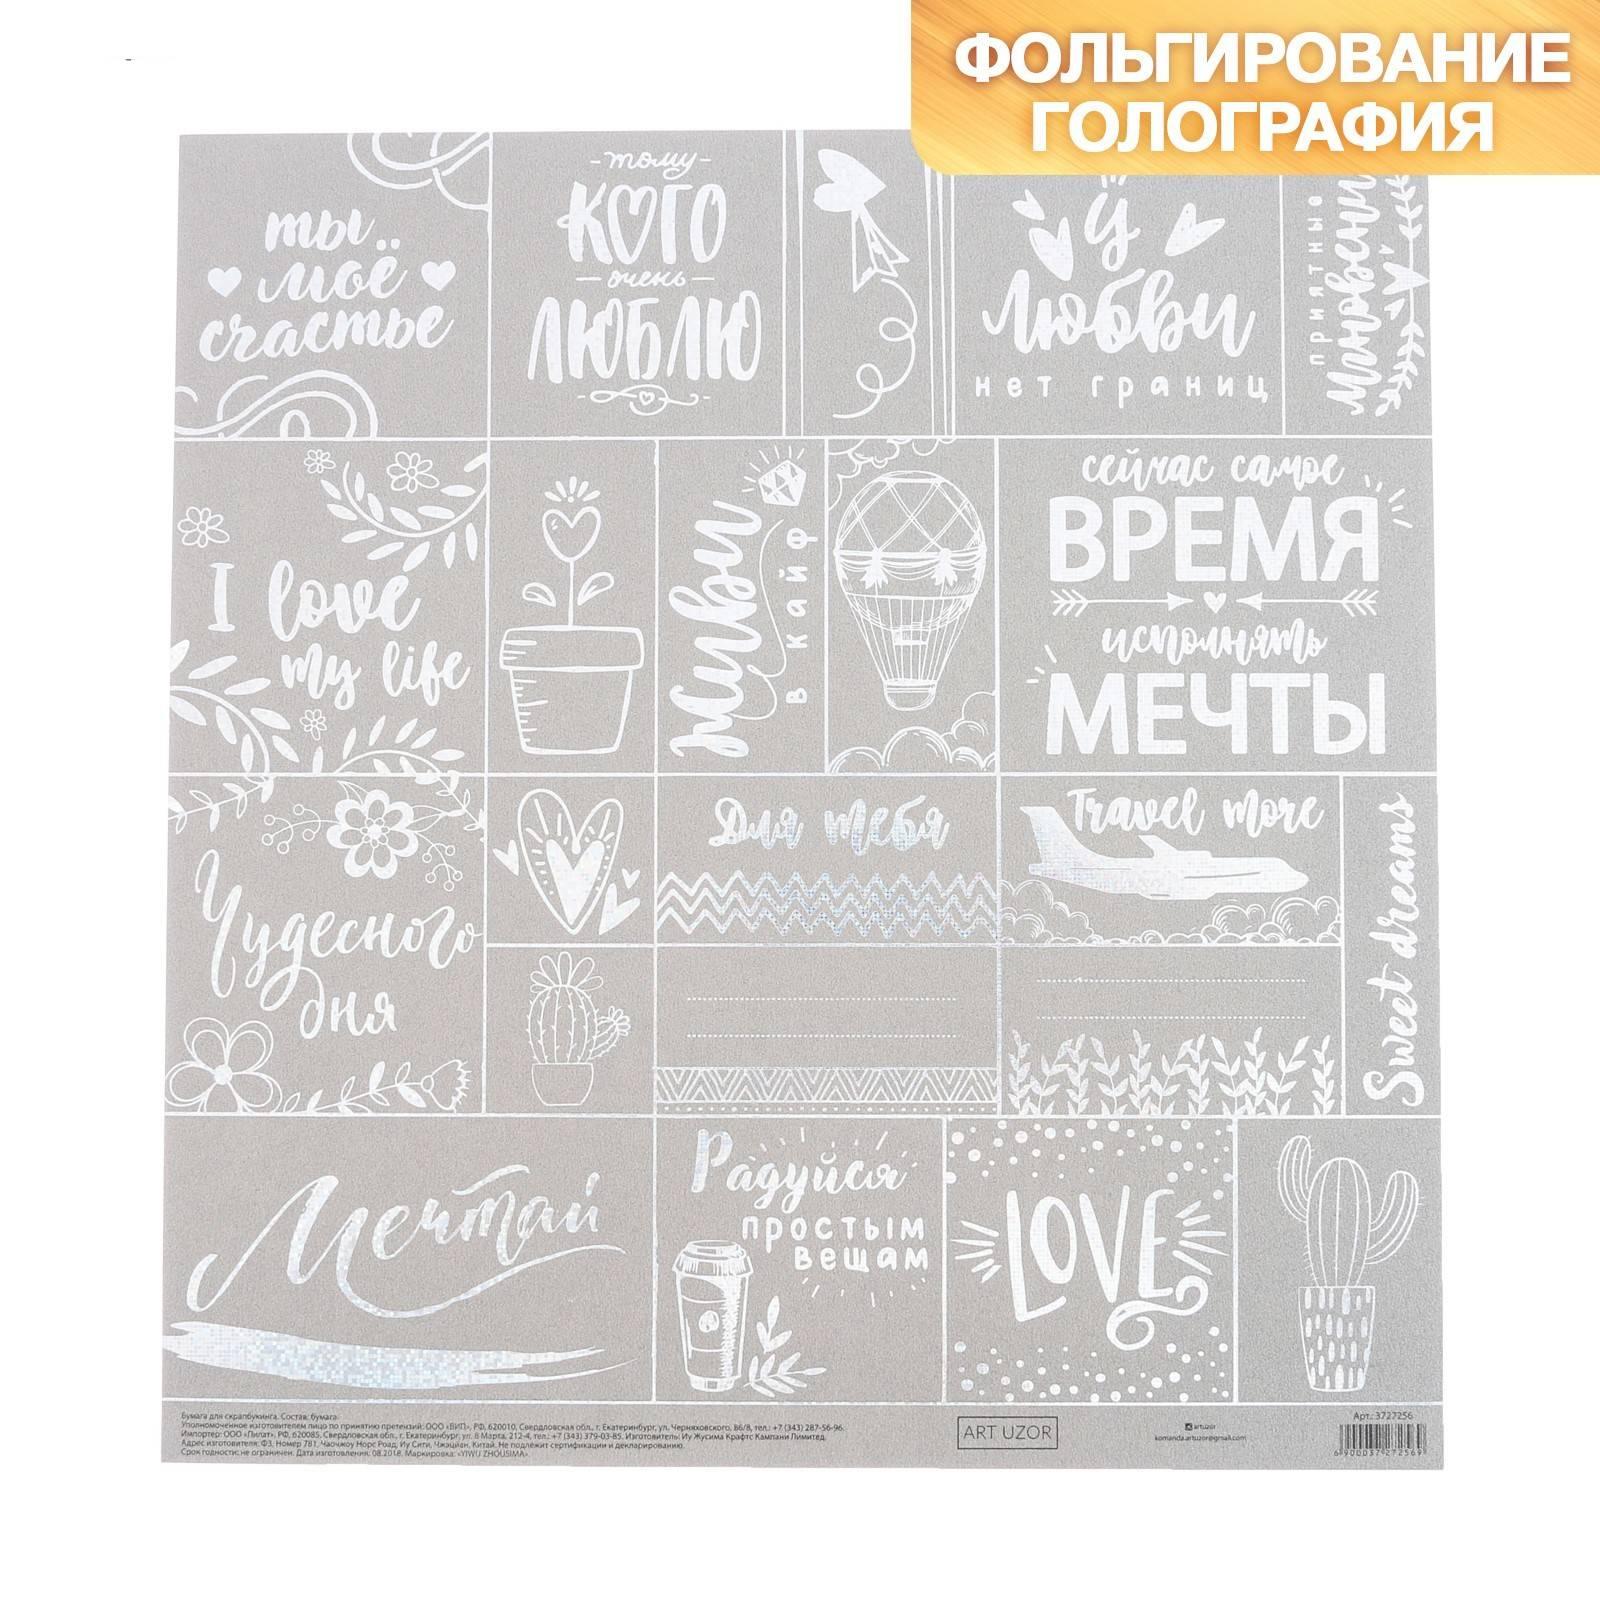 Бумага для скрапбукинга, жемчужная, Мечтай, 30,5×32 см, 250г/м, АртУзор